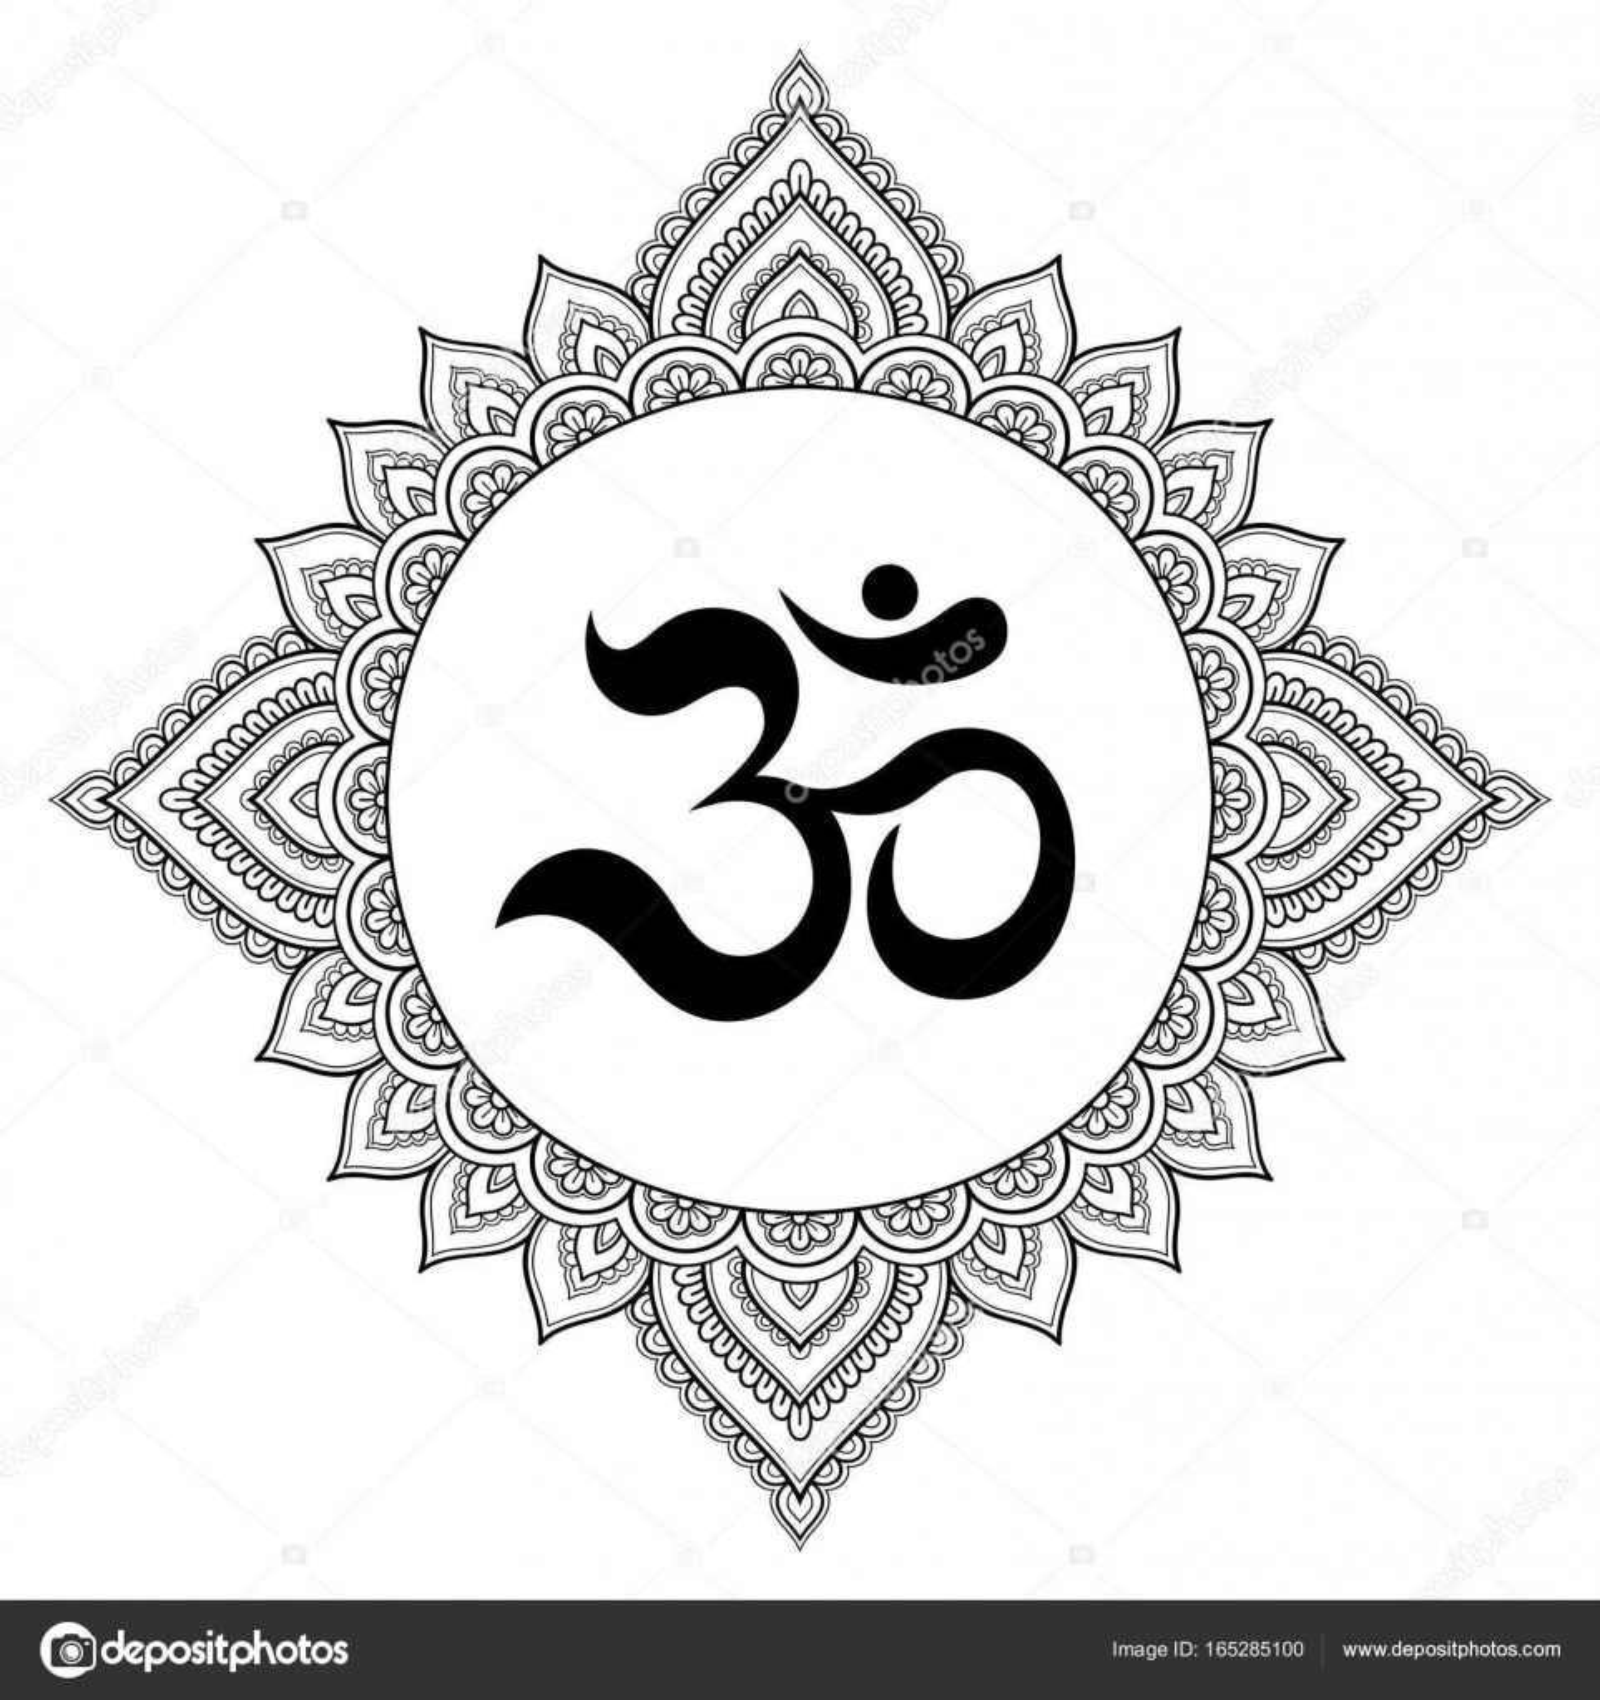 Circular pattern in the form of a mandala om decorative symbol om decorative symbol mehndi style decorative pattern in oriental style with the ancient hindu mantra om henna tattoo pattern in indian style buycottarizona